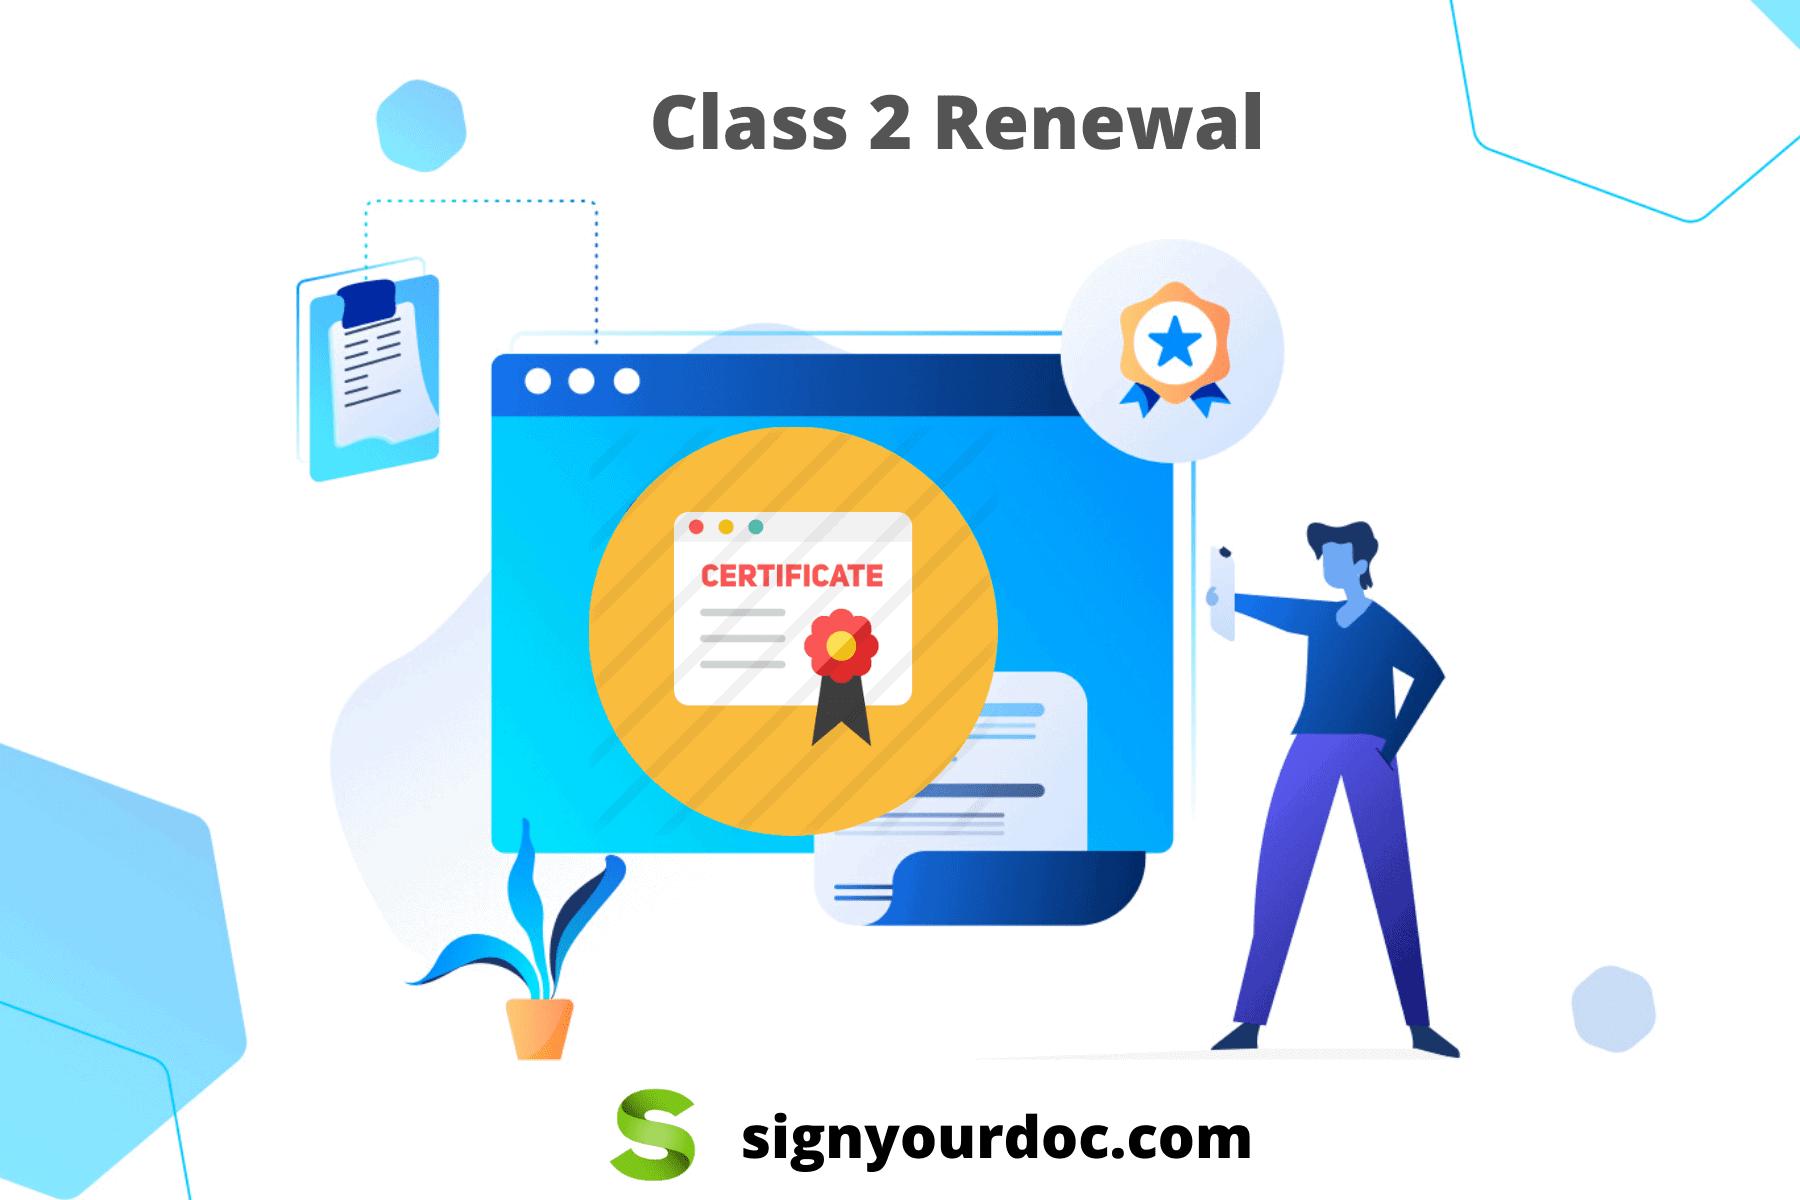 Class 2 Renewal Digital signature